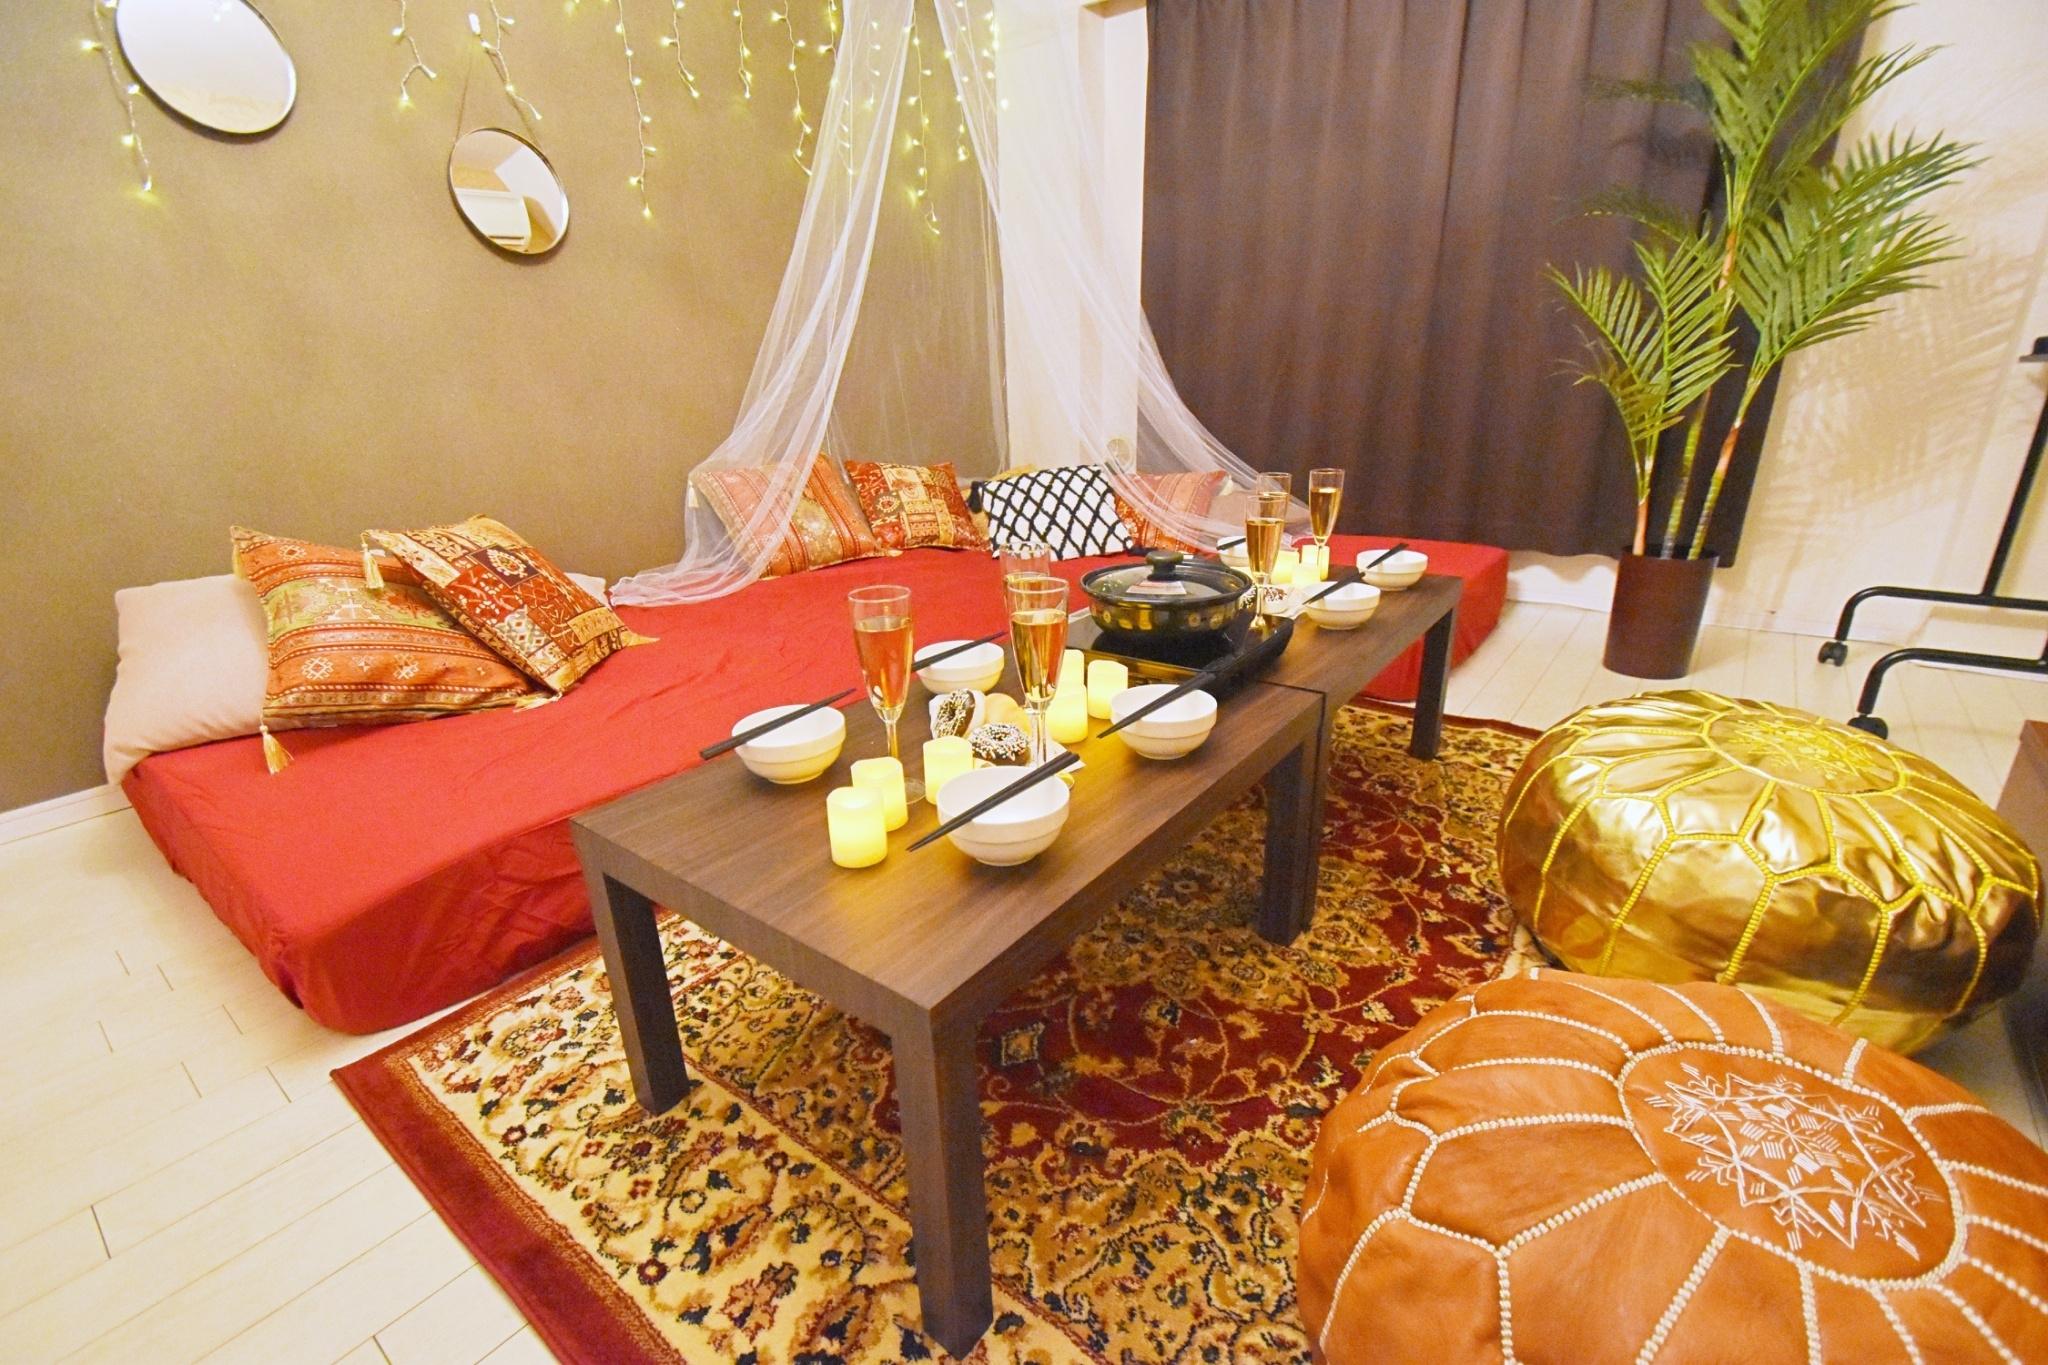 SP132Morocco渋谷 シェアスペMorocco渋谷の室内の写真